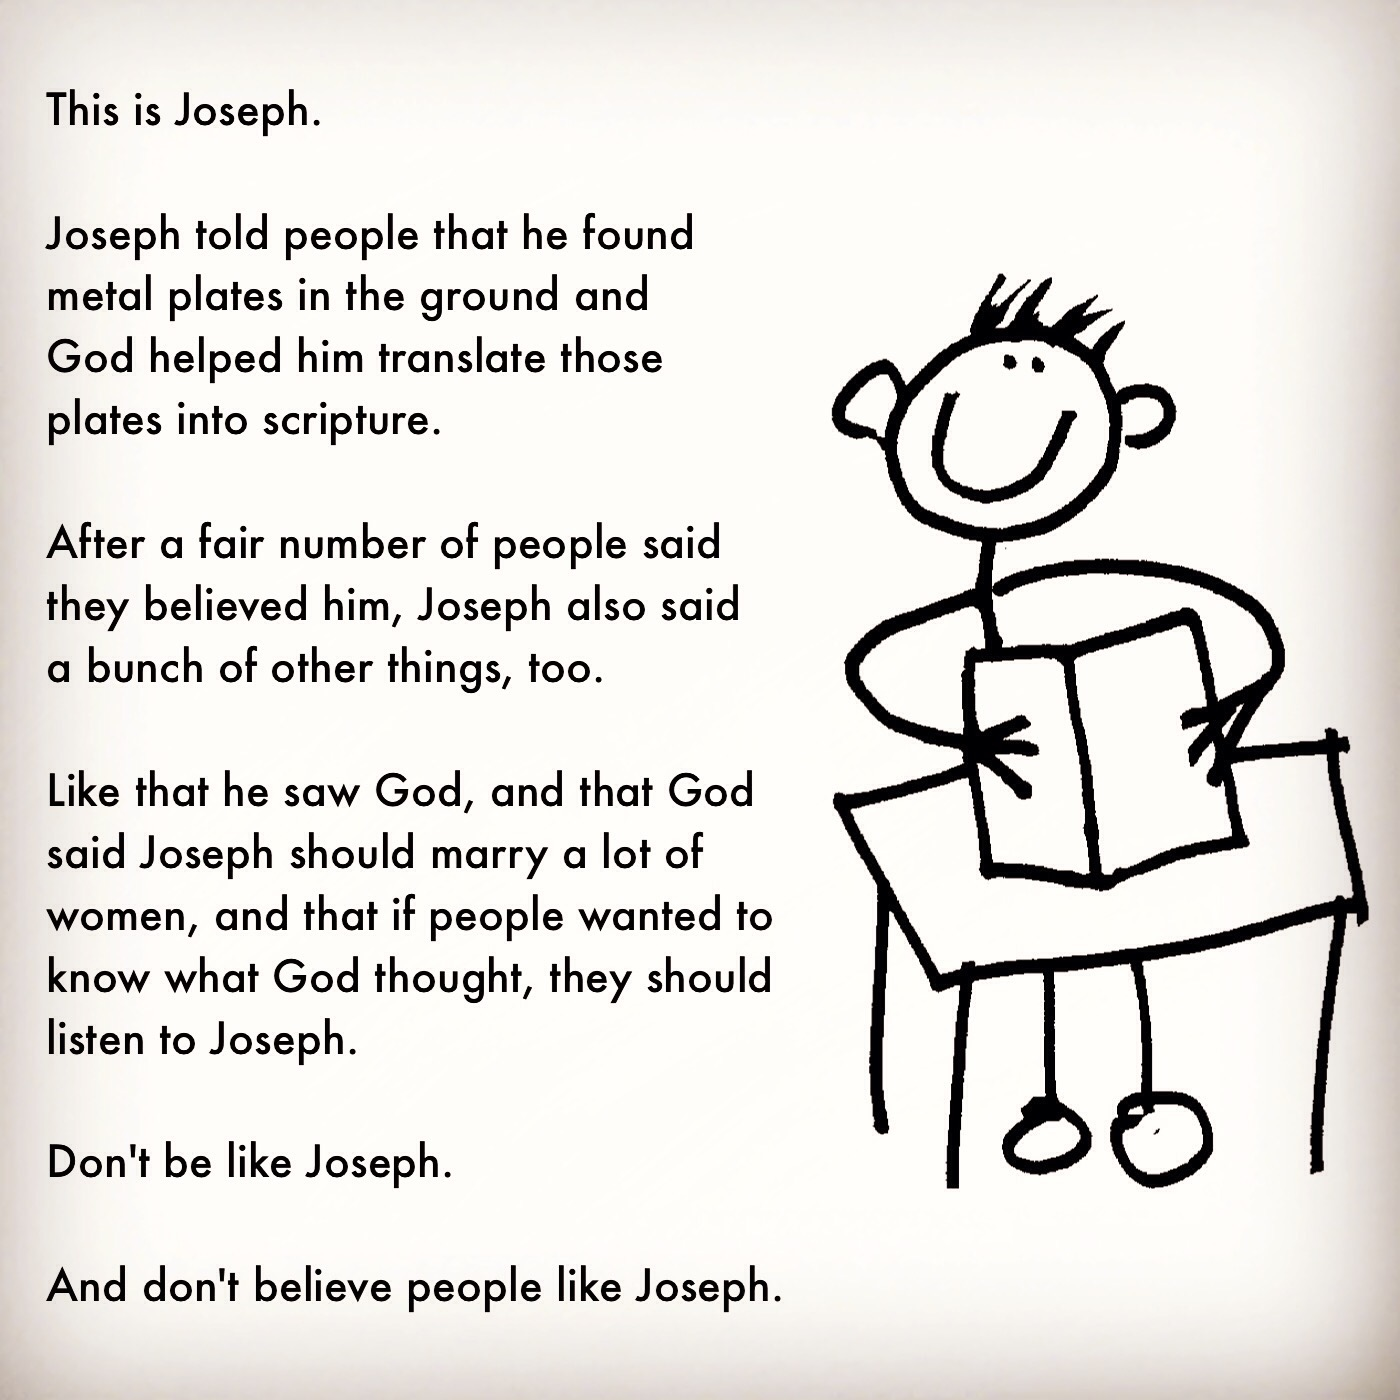 This is Joseph